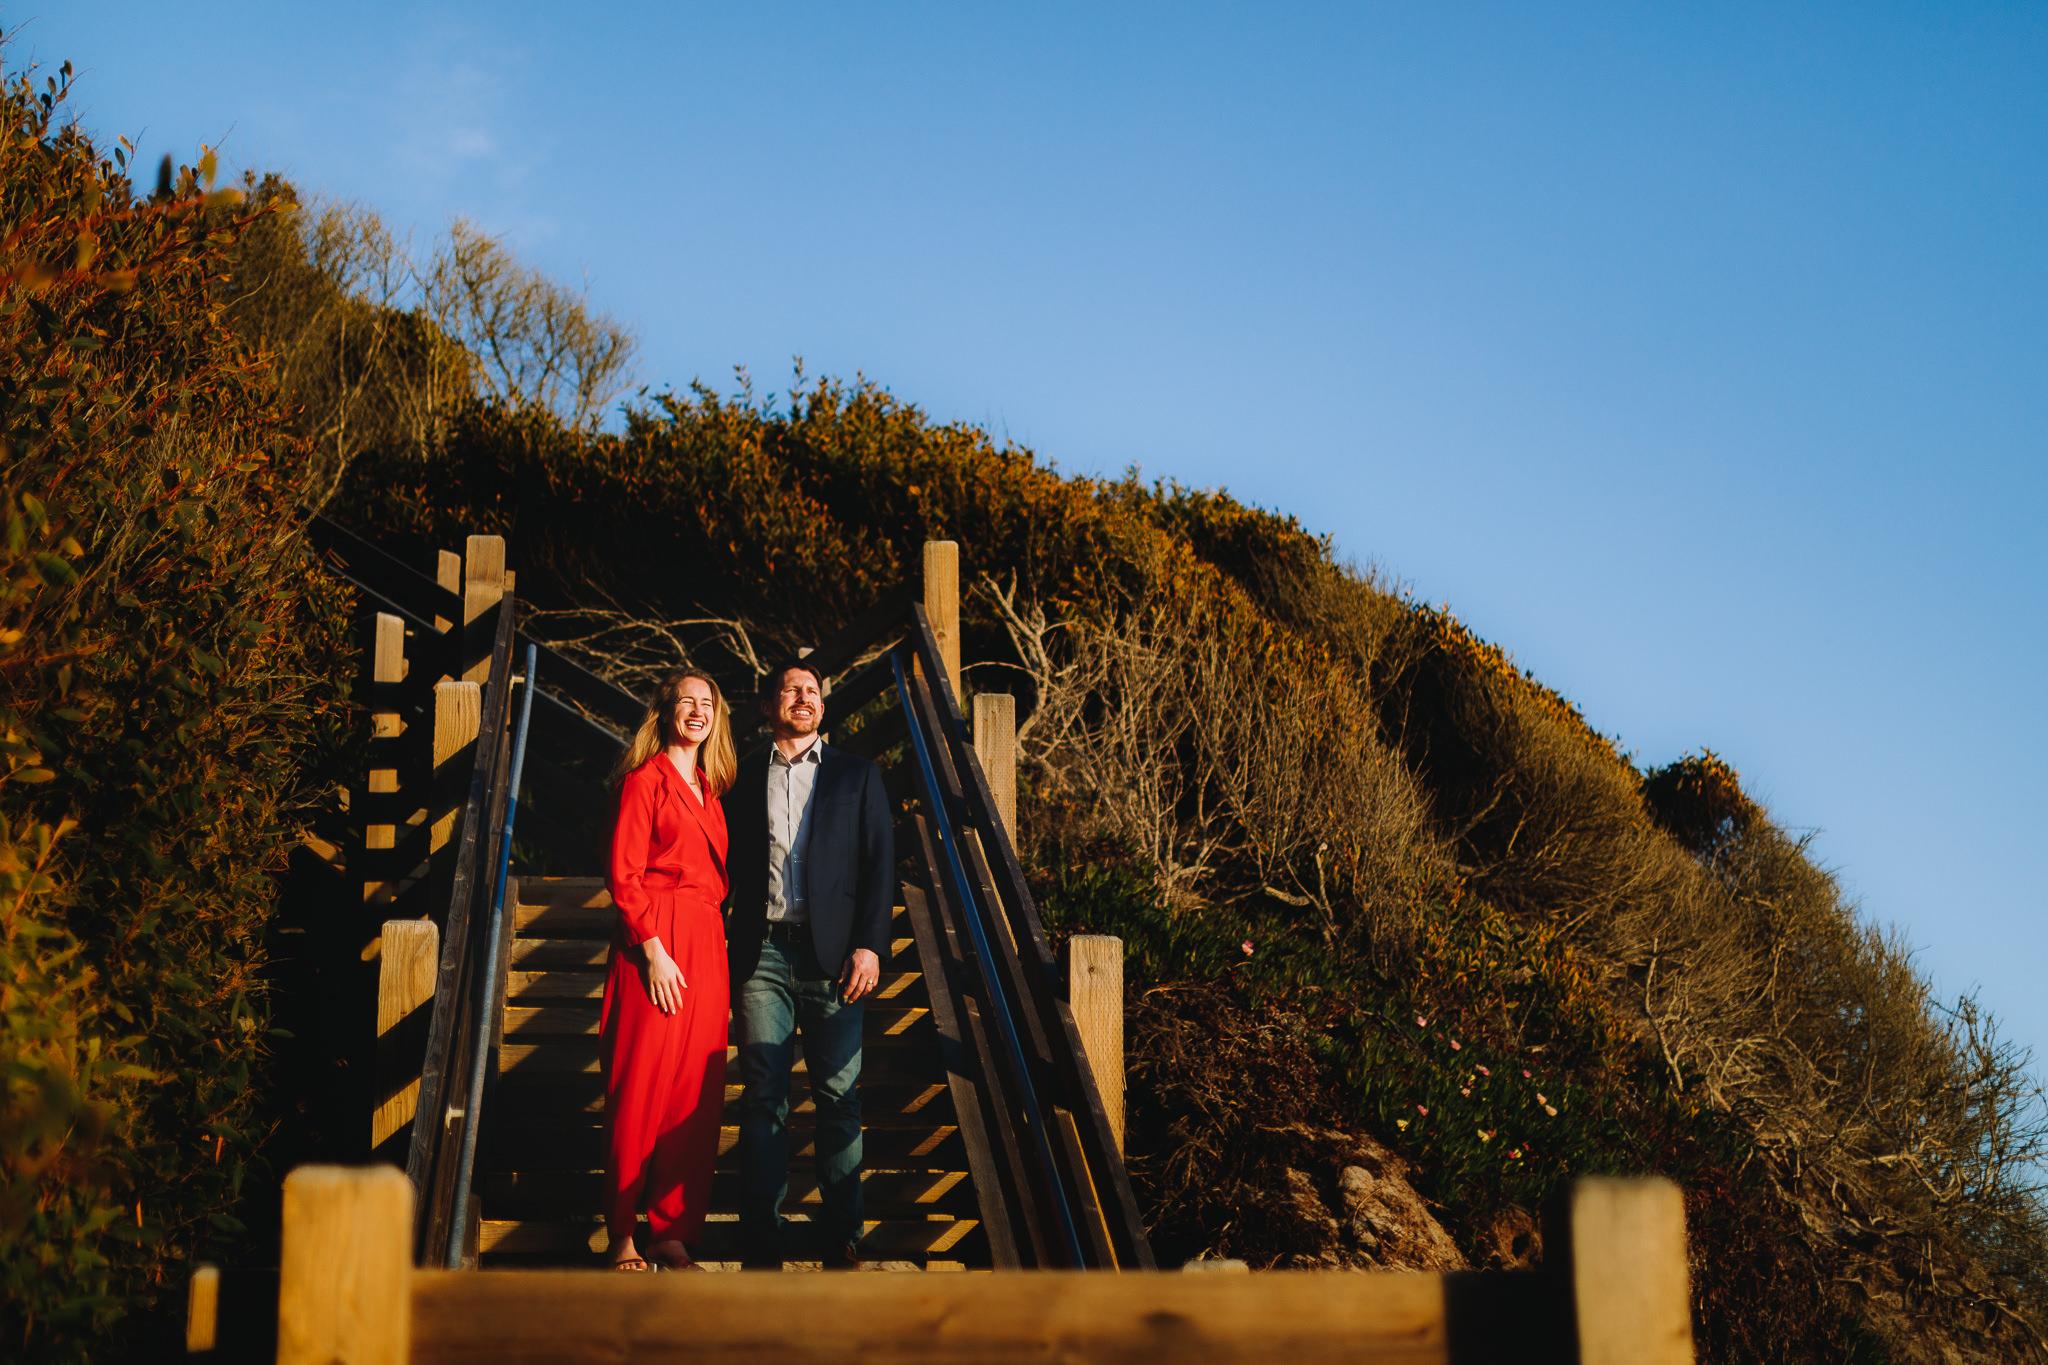 Archer Inspired Photography Carmel Beach California Wedding Engagement Lifestyle Anniversary Natural Light Photographer-12.jpg